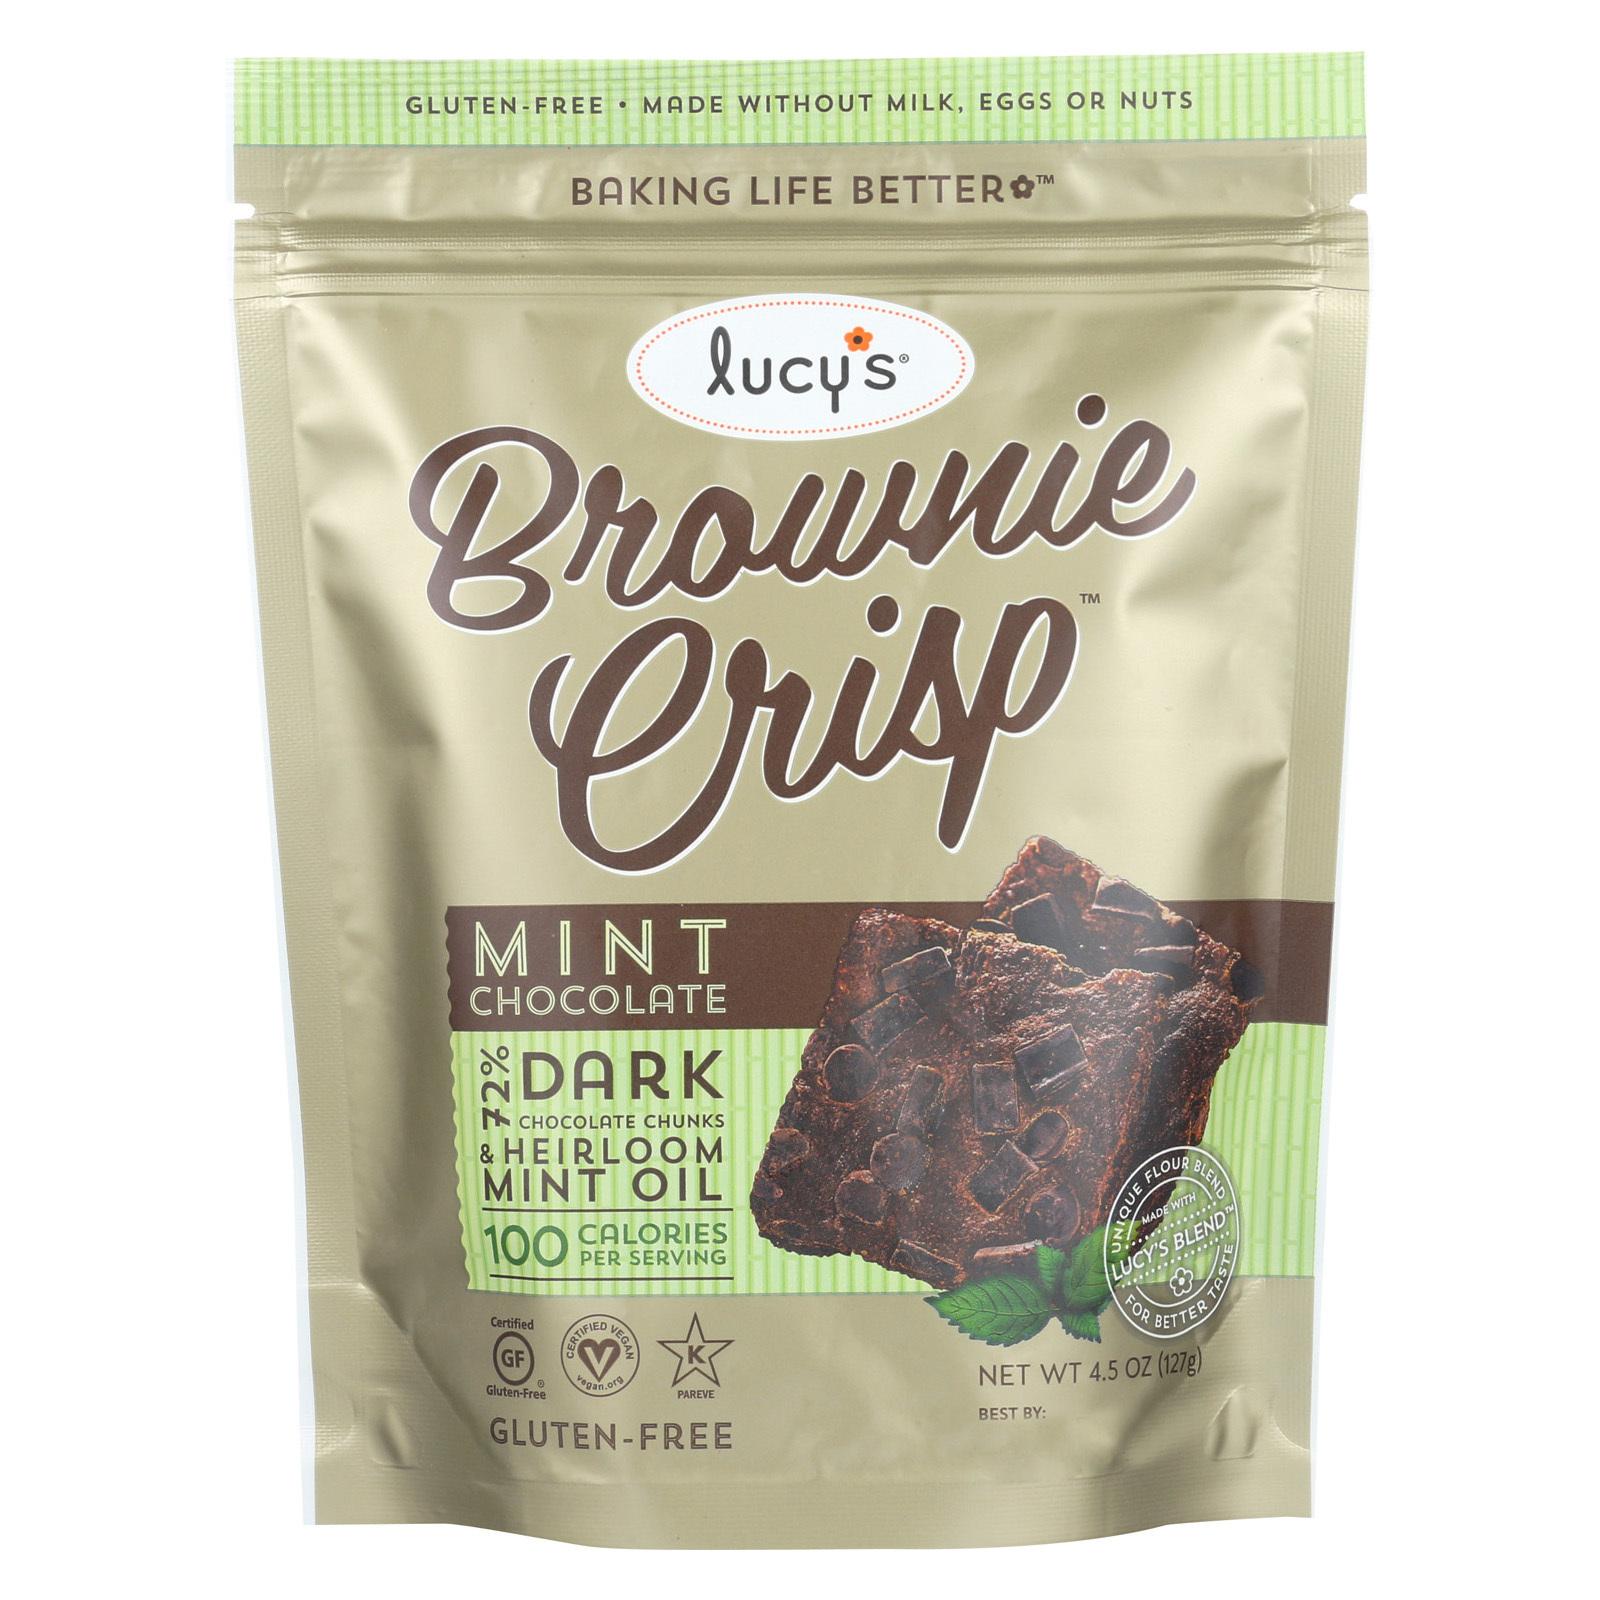 Dr. Lucy's Brownie Crisps - Mint - Case of 8 - 4.5 oz.